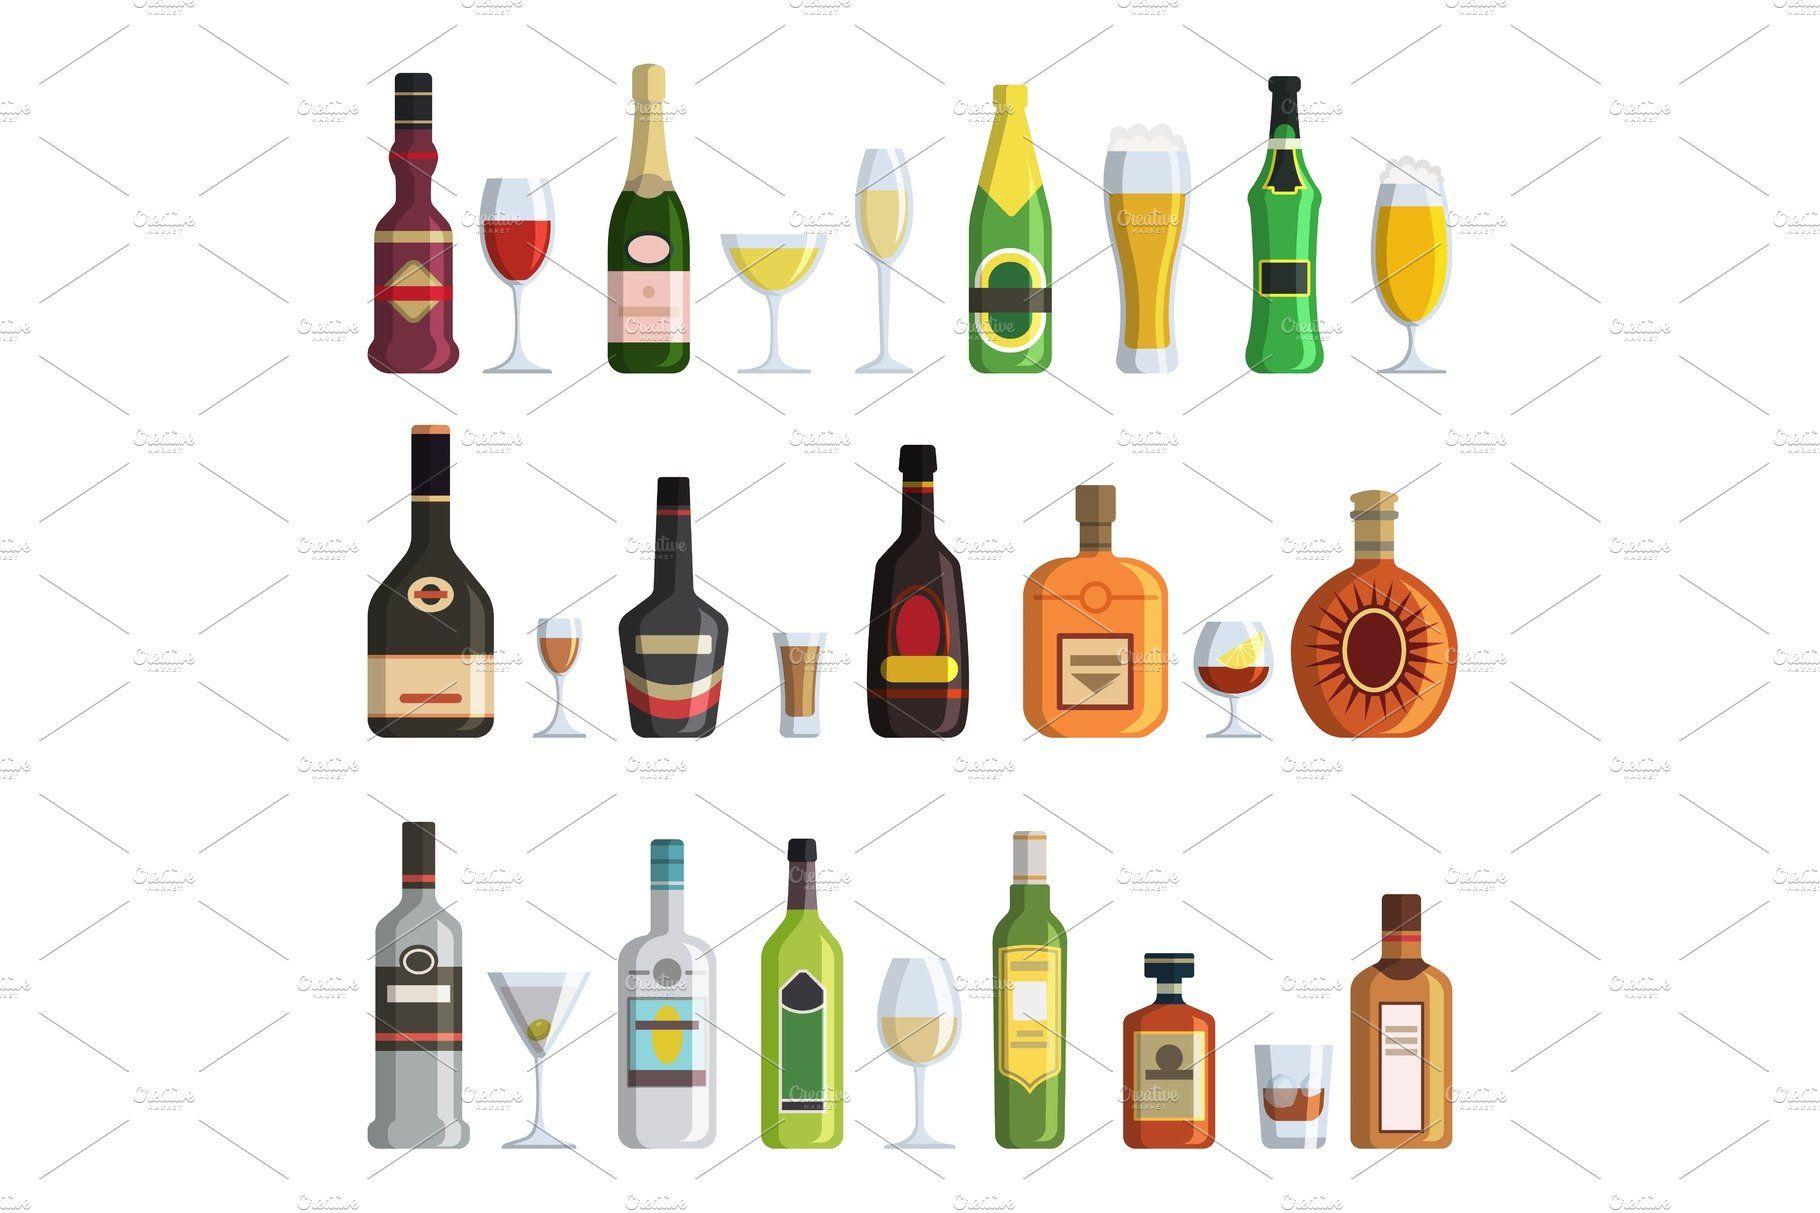 Illustrations Of Alcoholic Bottles And Glasses In Cartoon Style Cartoon Styles Alcohol Bottles Wine Design